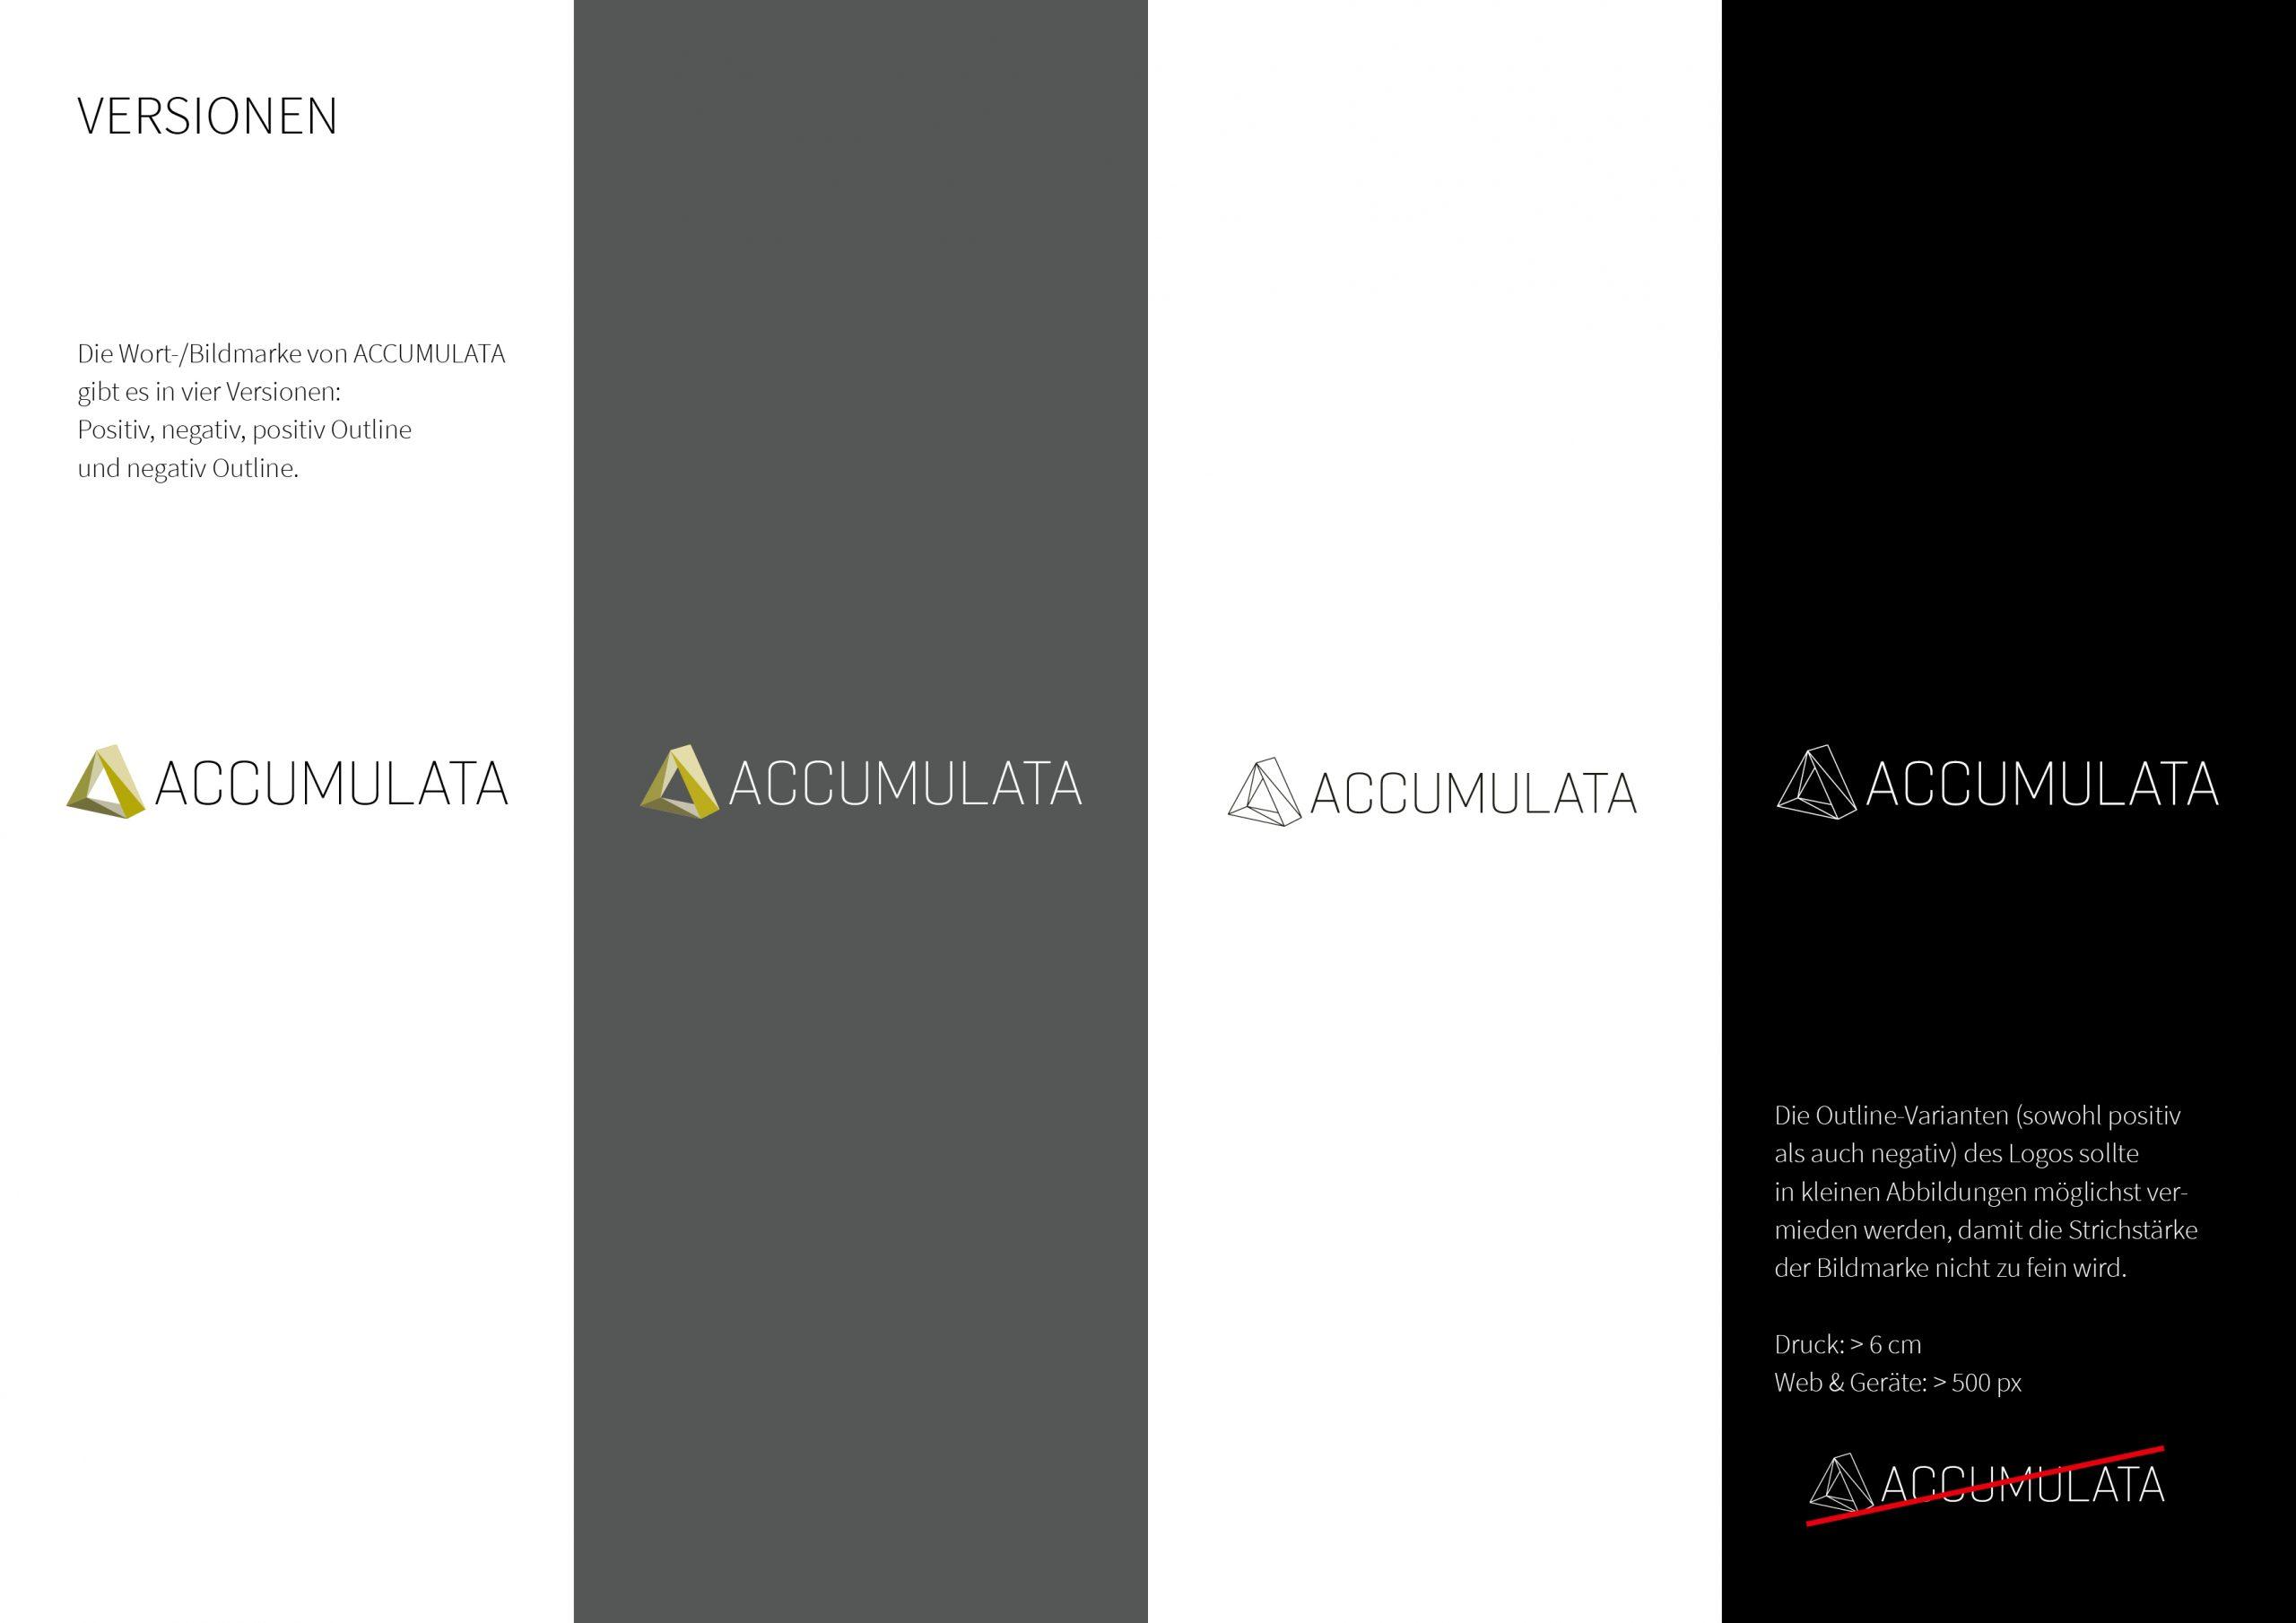 ACCUMULATA Styleguide Logovarianten